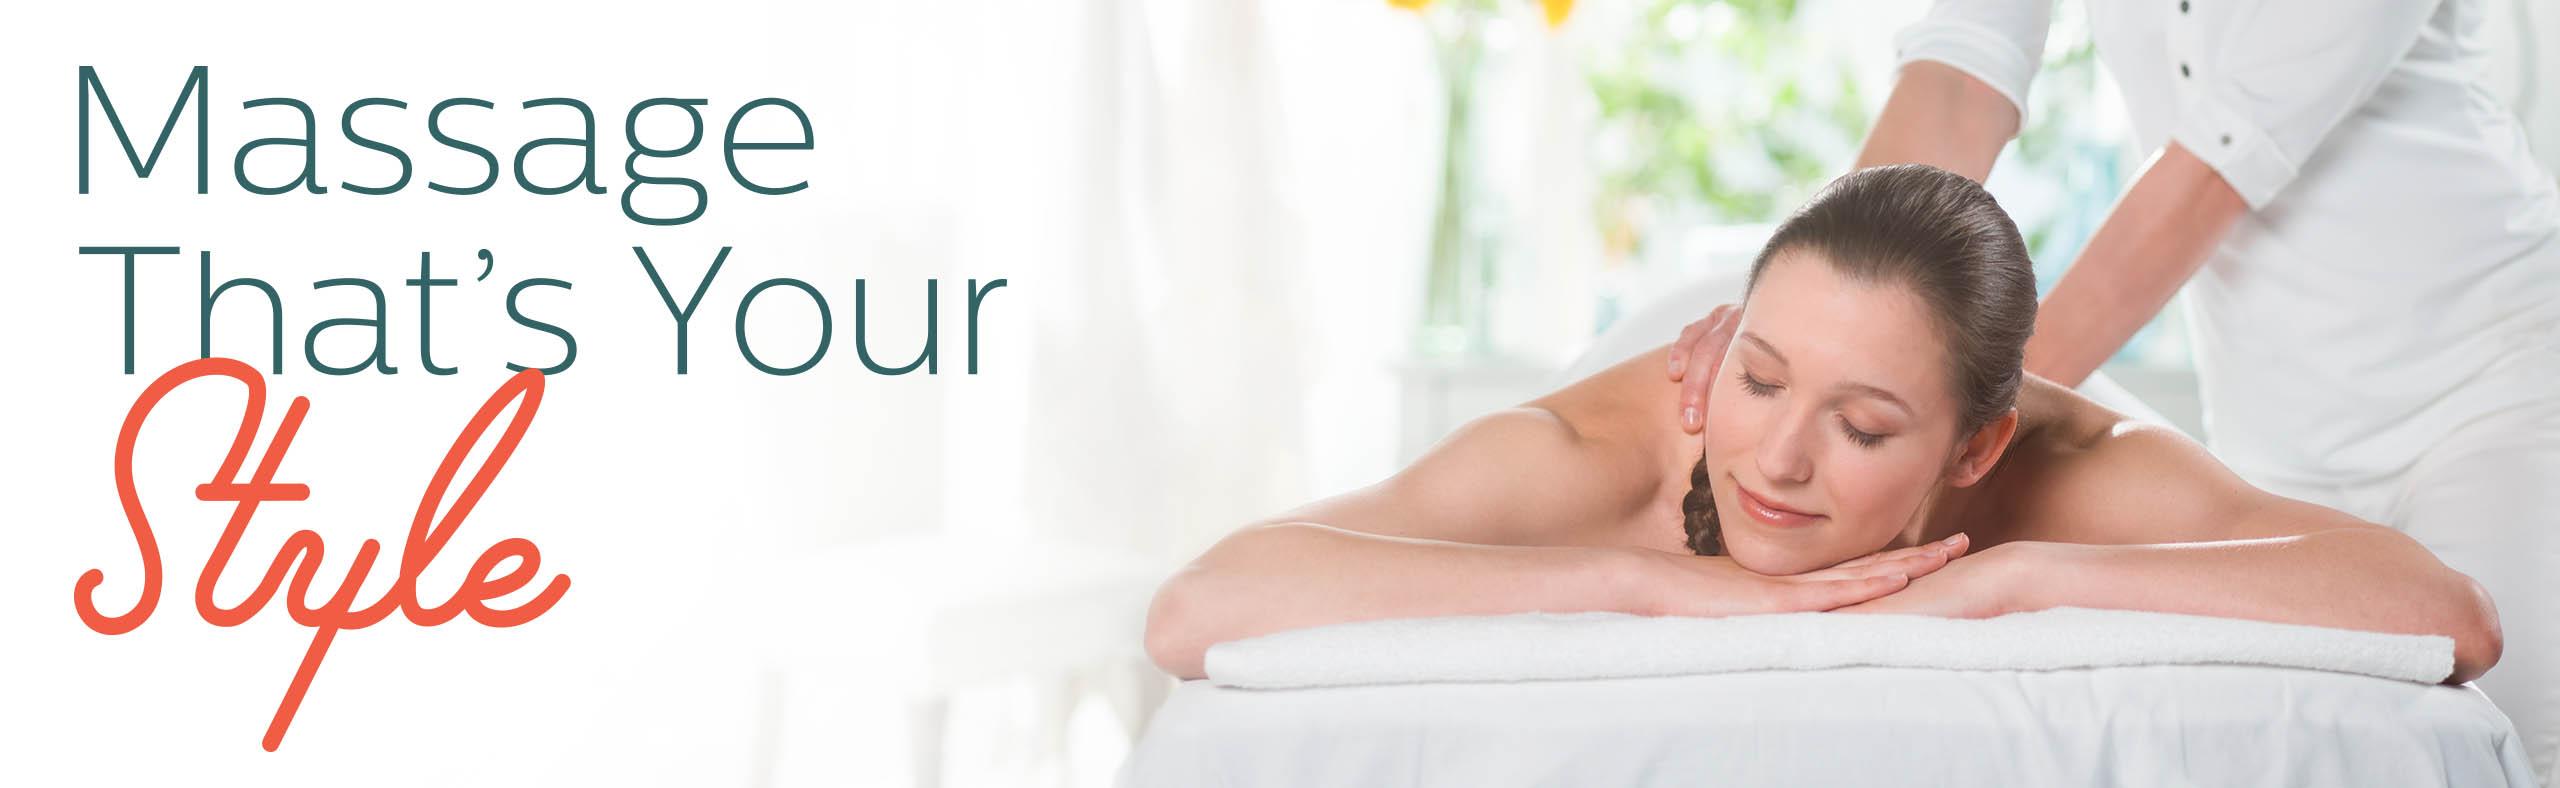 Studio massage simi valley